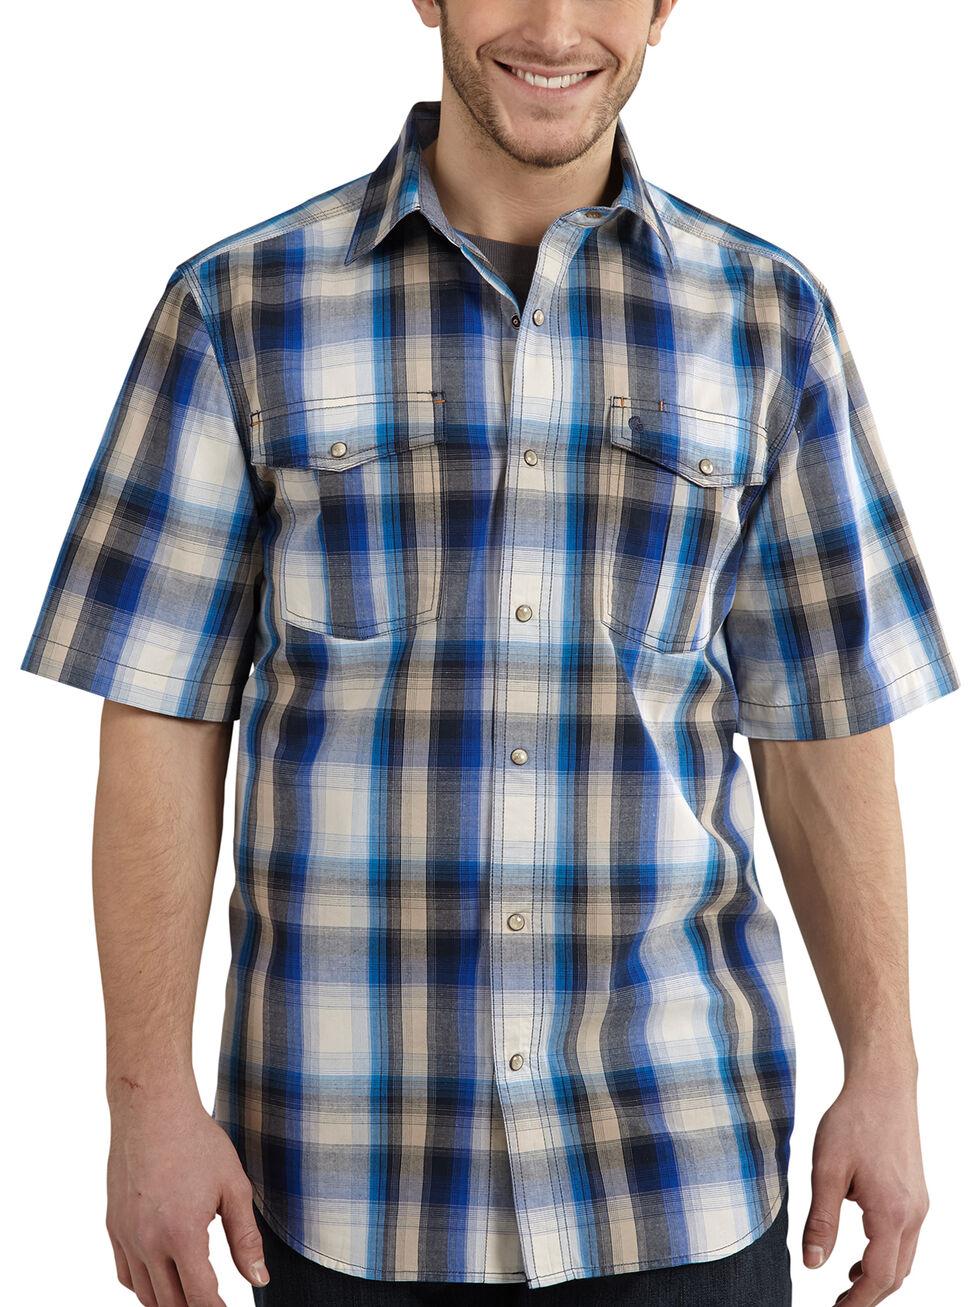 Carhartt Bozeman Short Sleeve Plaid Work Shirt, Blue, hi-res